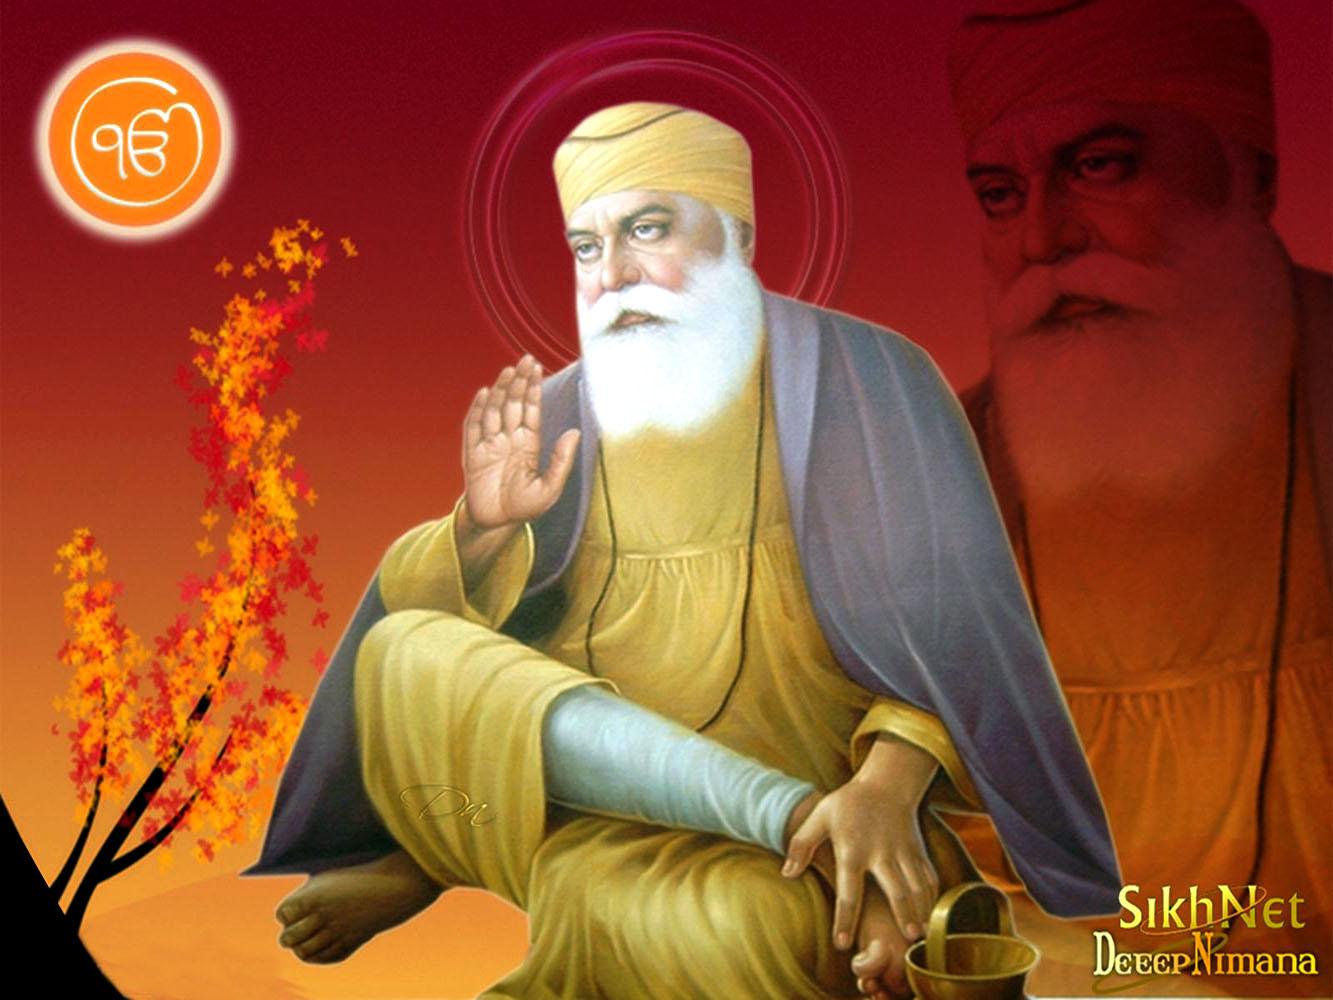 2017 05 guru nanak dev ji quotes - 2017 05 Guru Nanak Dev Ji Quotes 7